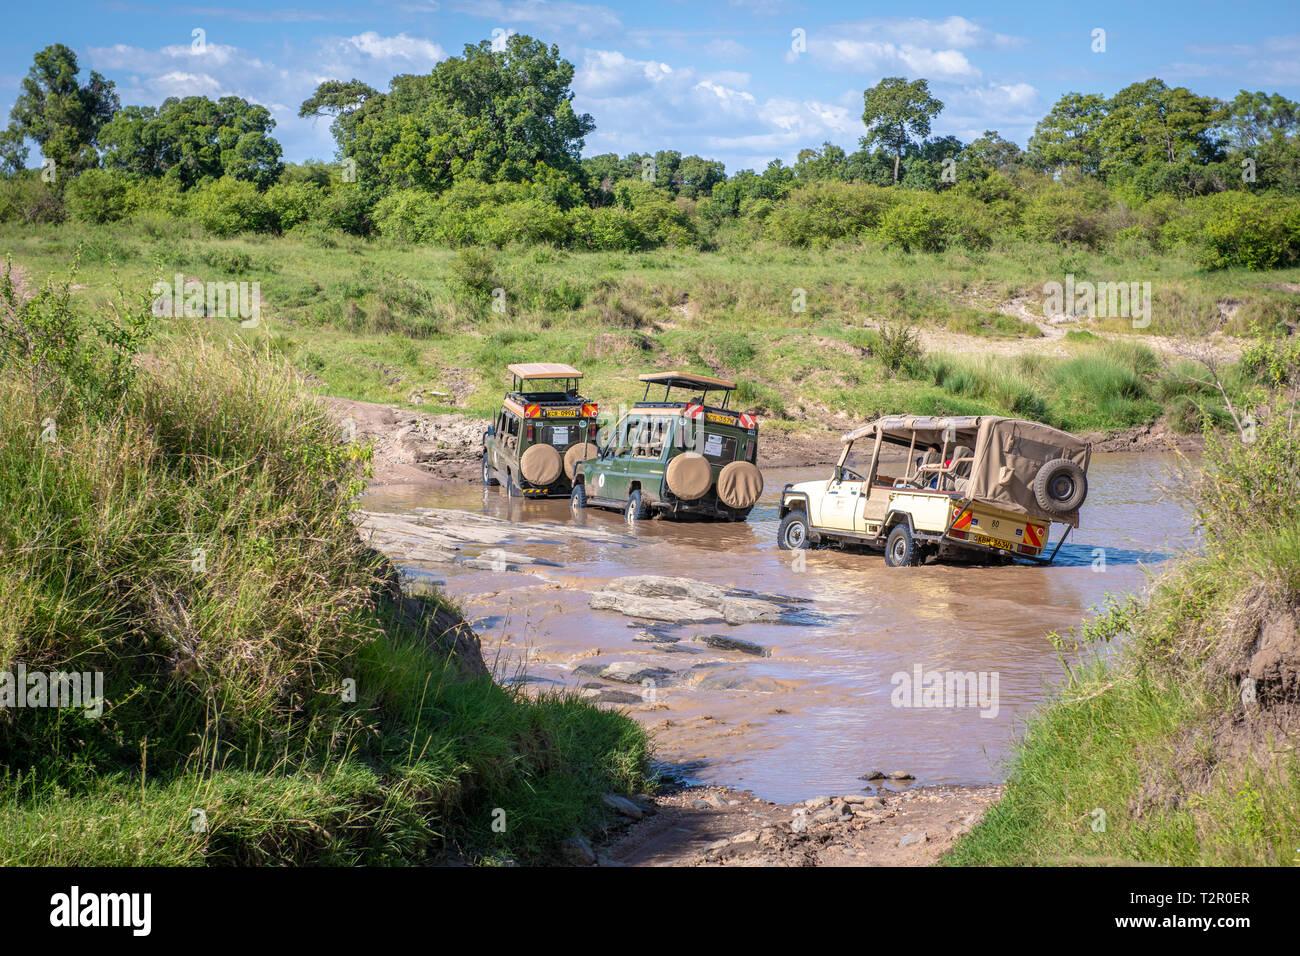 Game viewers carrying tourist drive through a stream in Maasai Mara National Reserve, Kenya - Stock Image